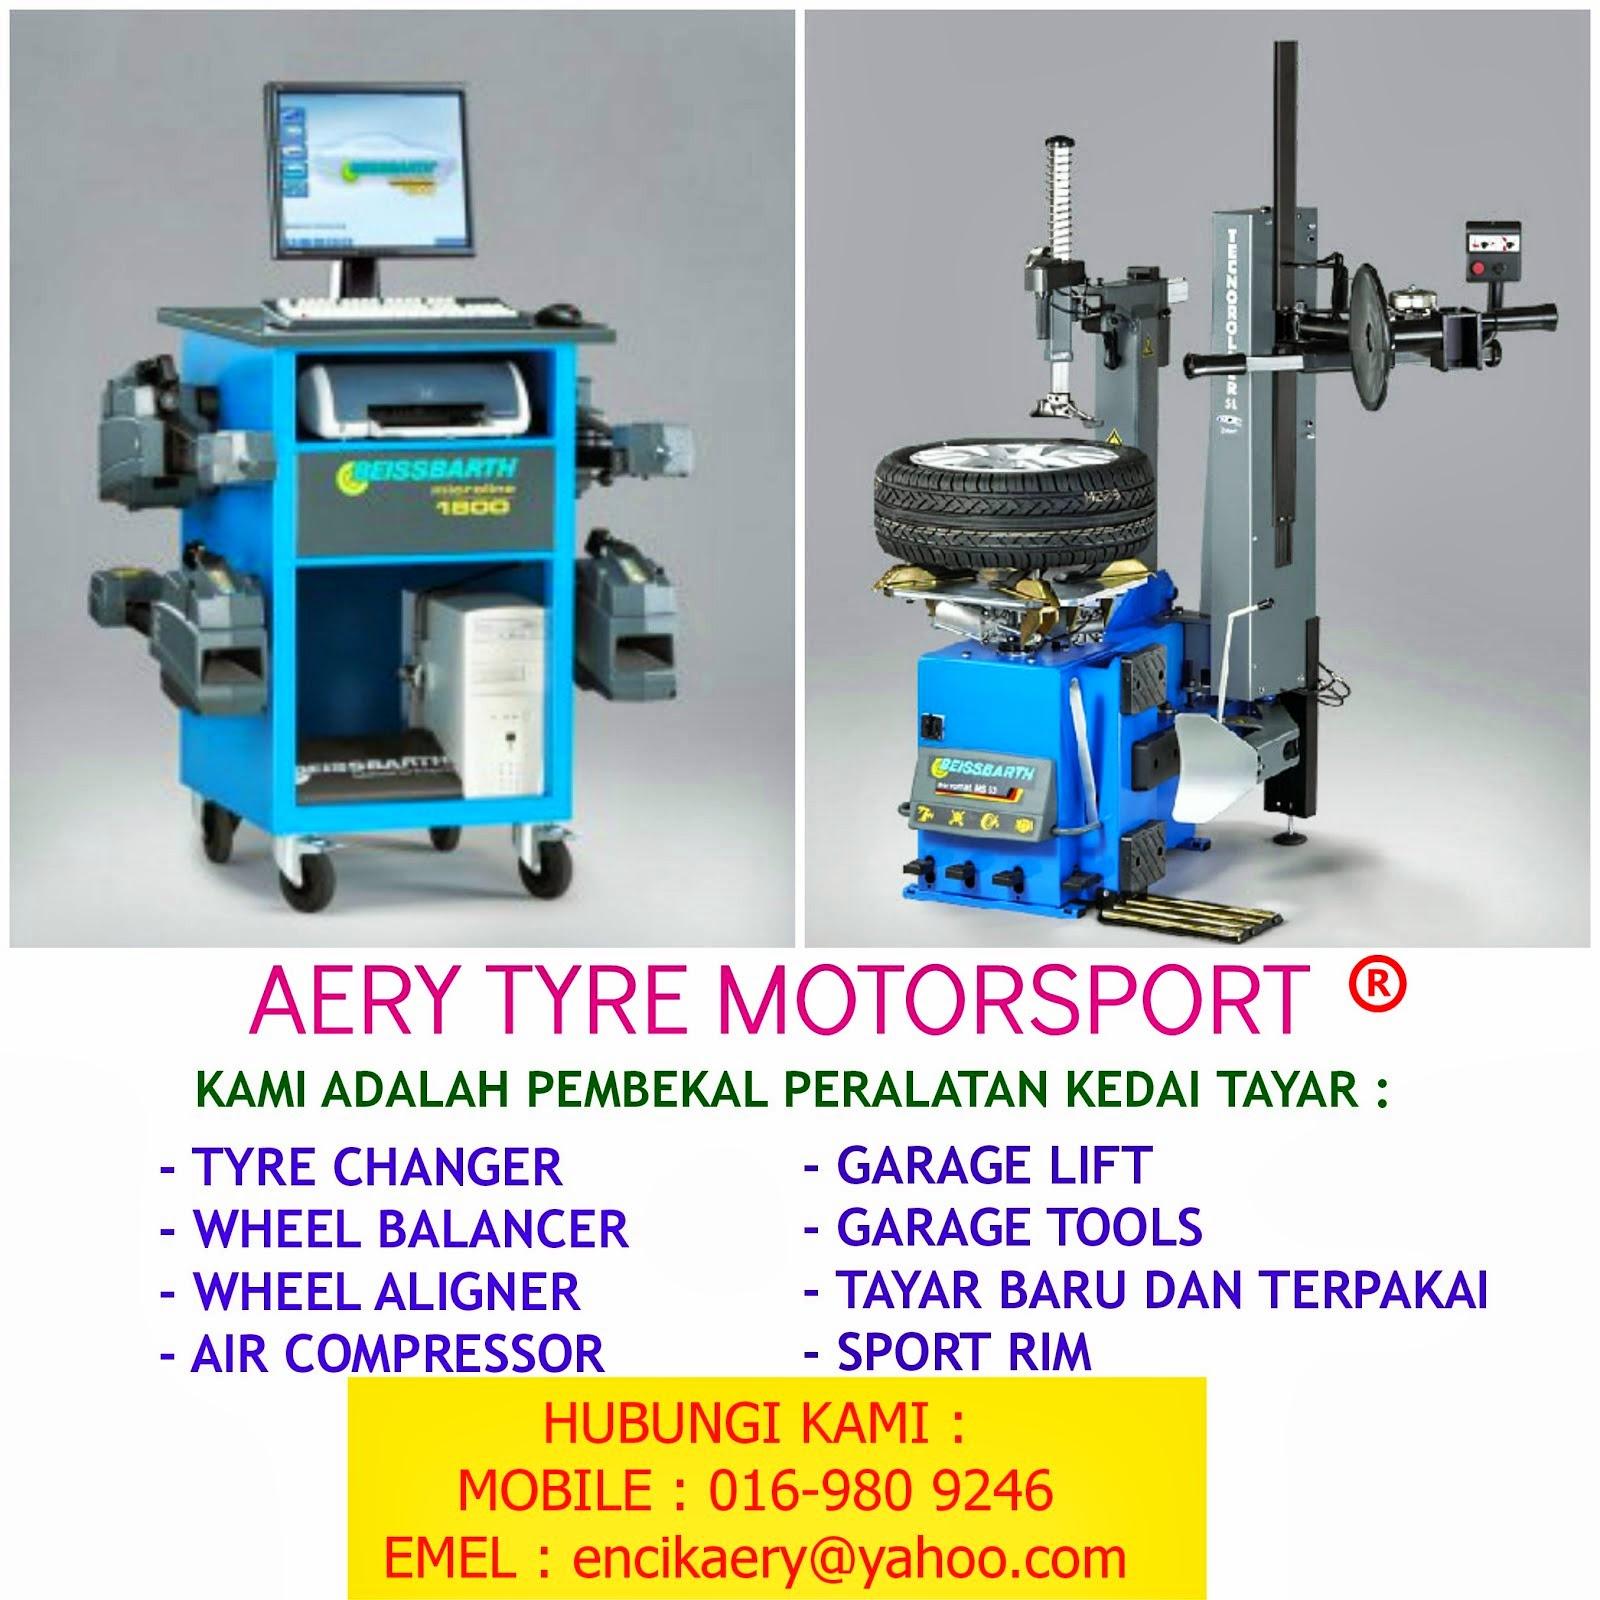 AERY TYRE MOTORSPORT